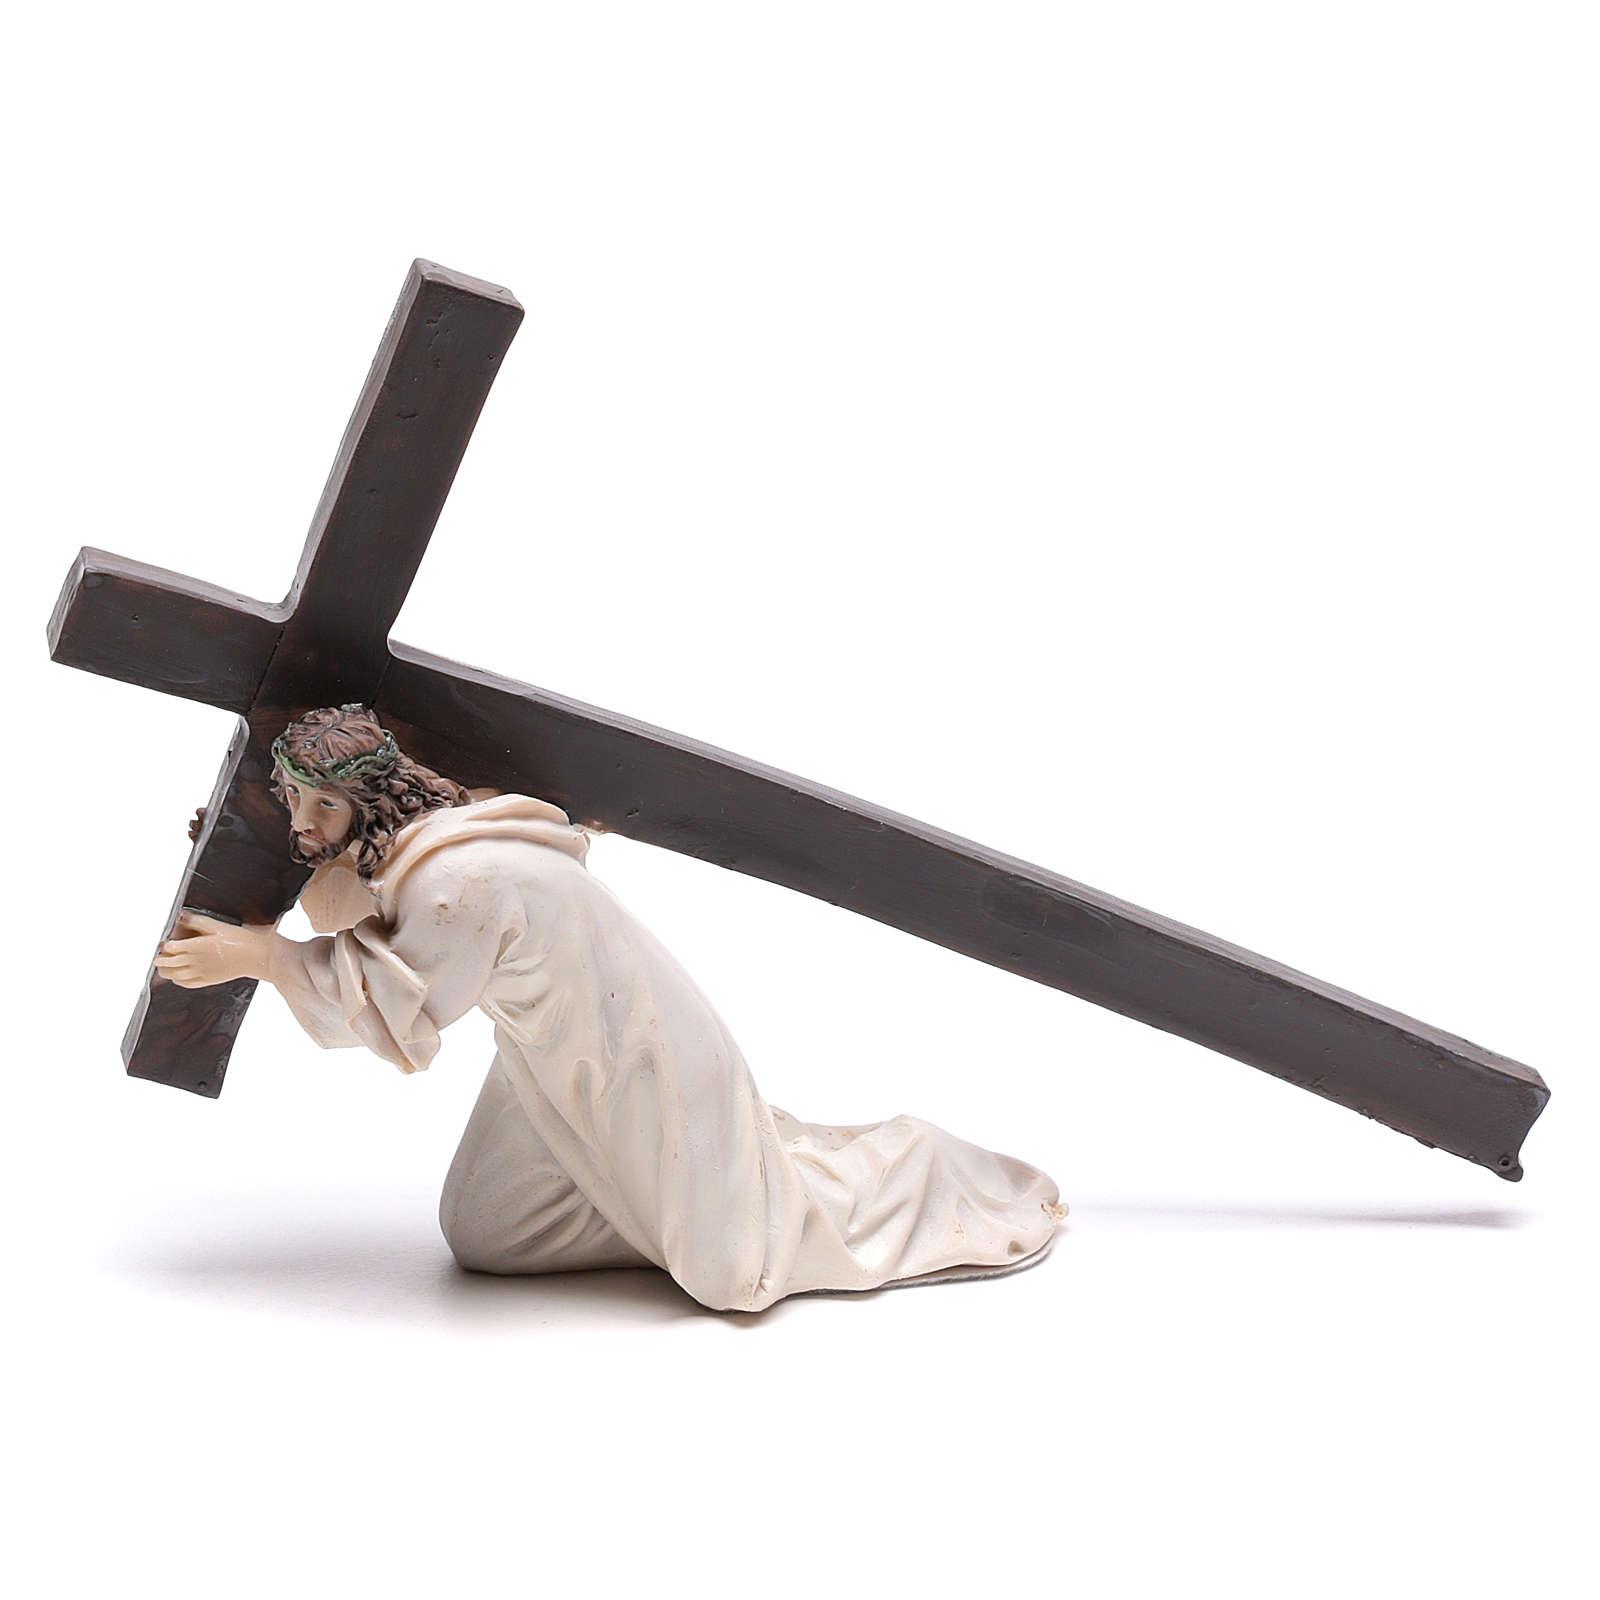 Statuina Gesù cadente con croce 9 cm 4